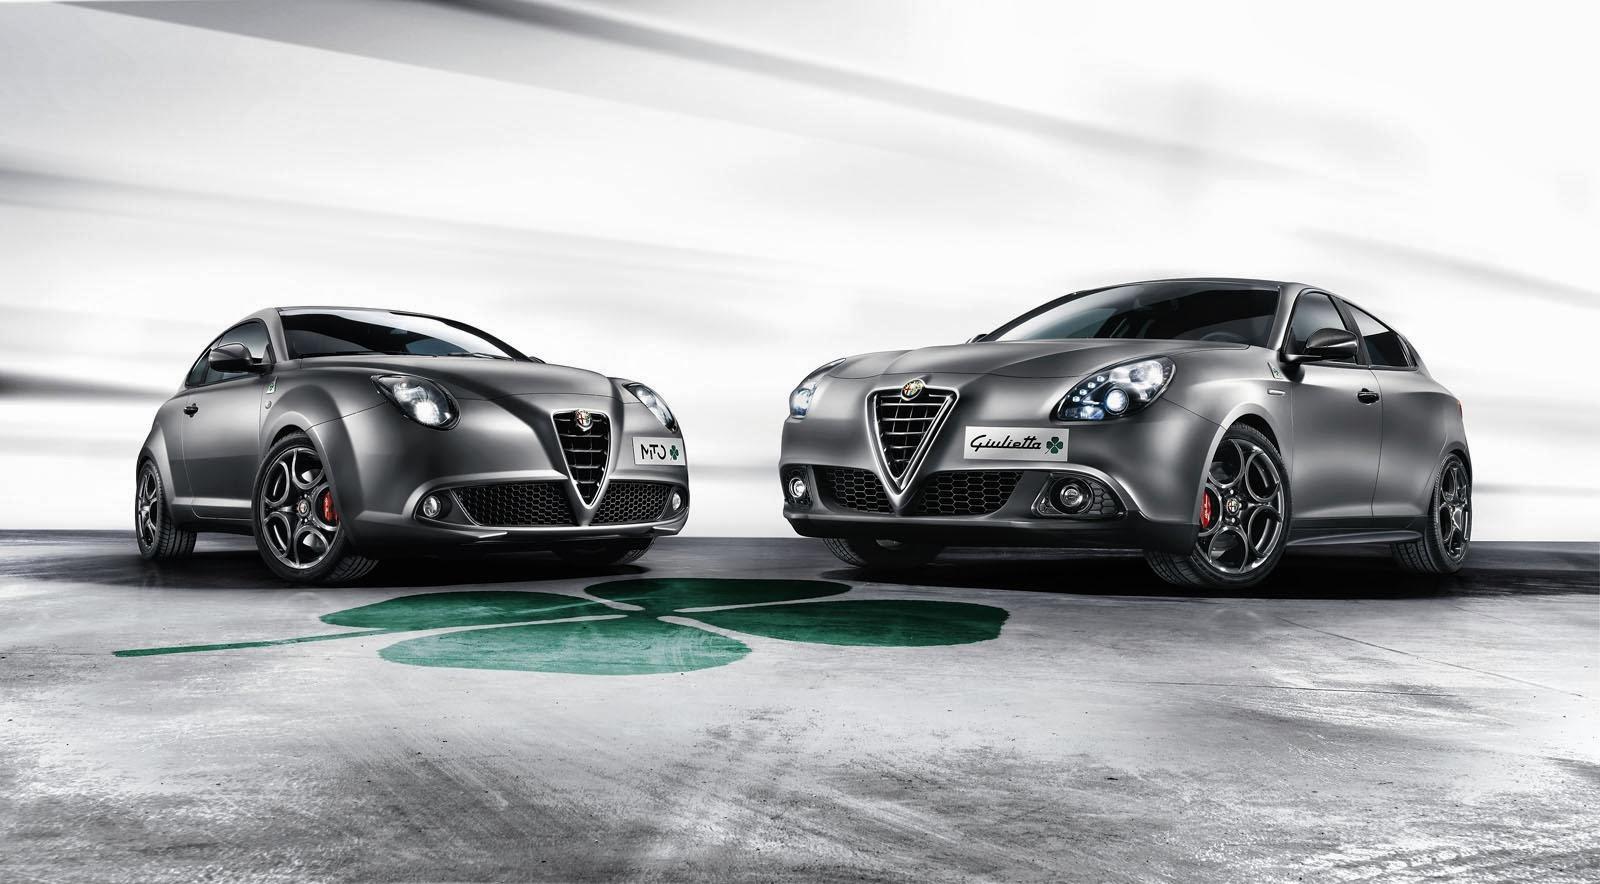 [Resim: Alfa+Romeo+MiTo+ve+Giulietta+Quadrifoglio+Verde+1.jpg]